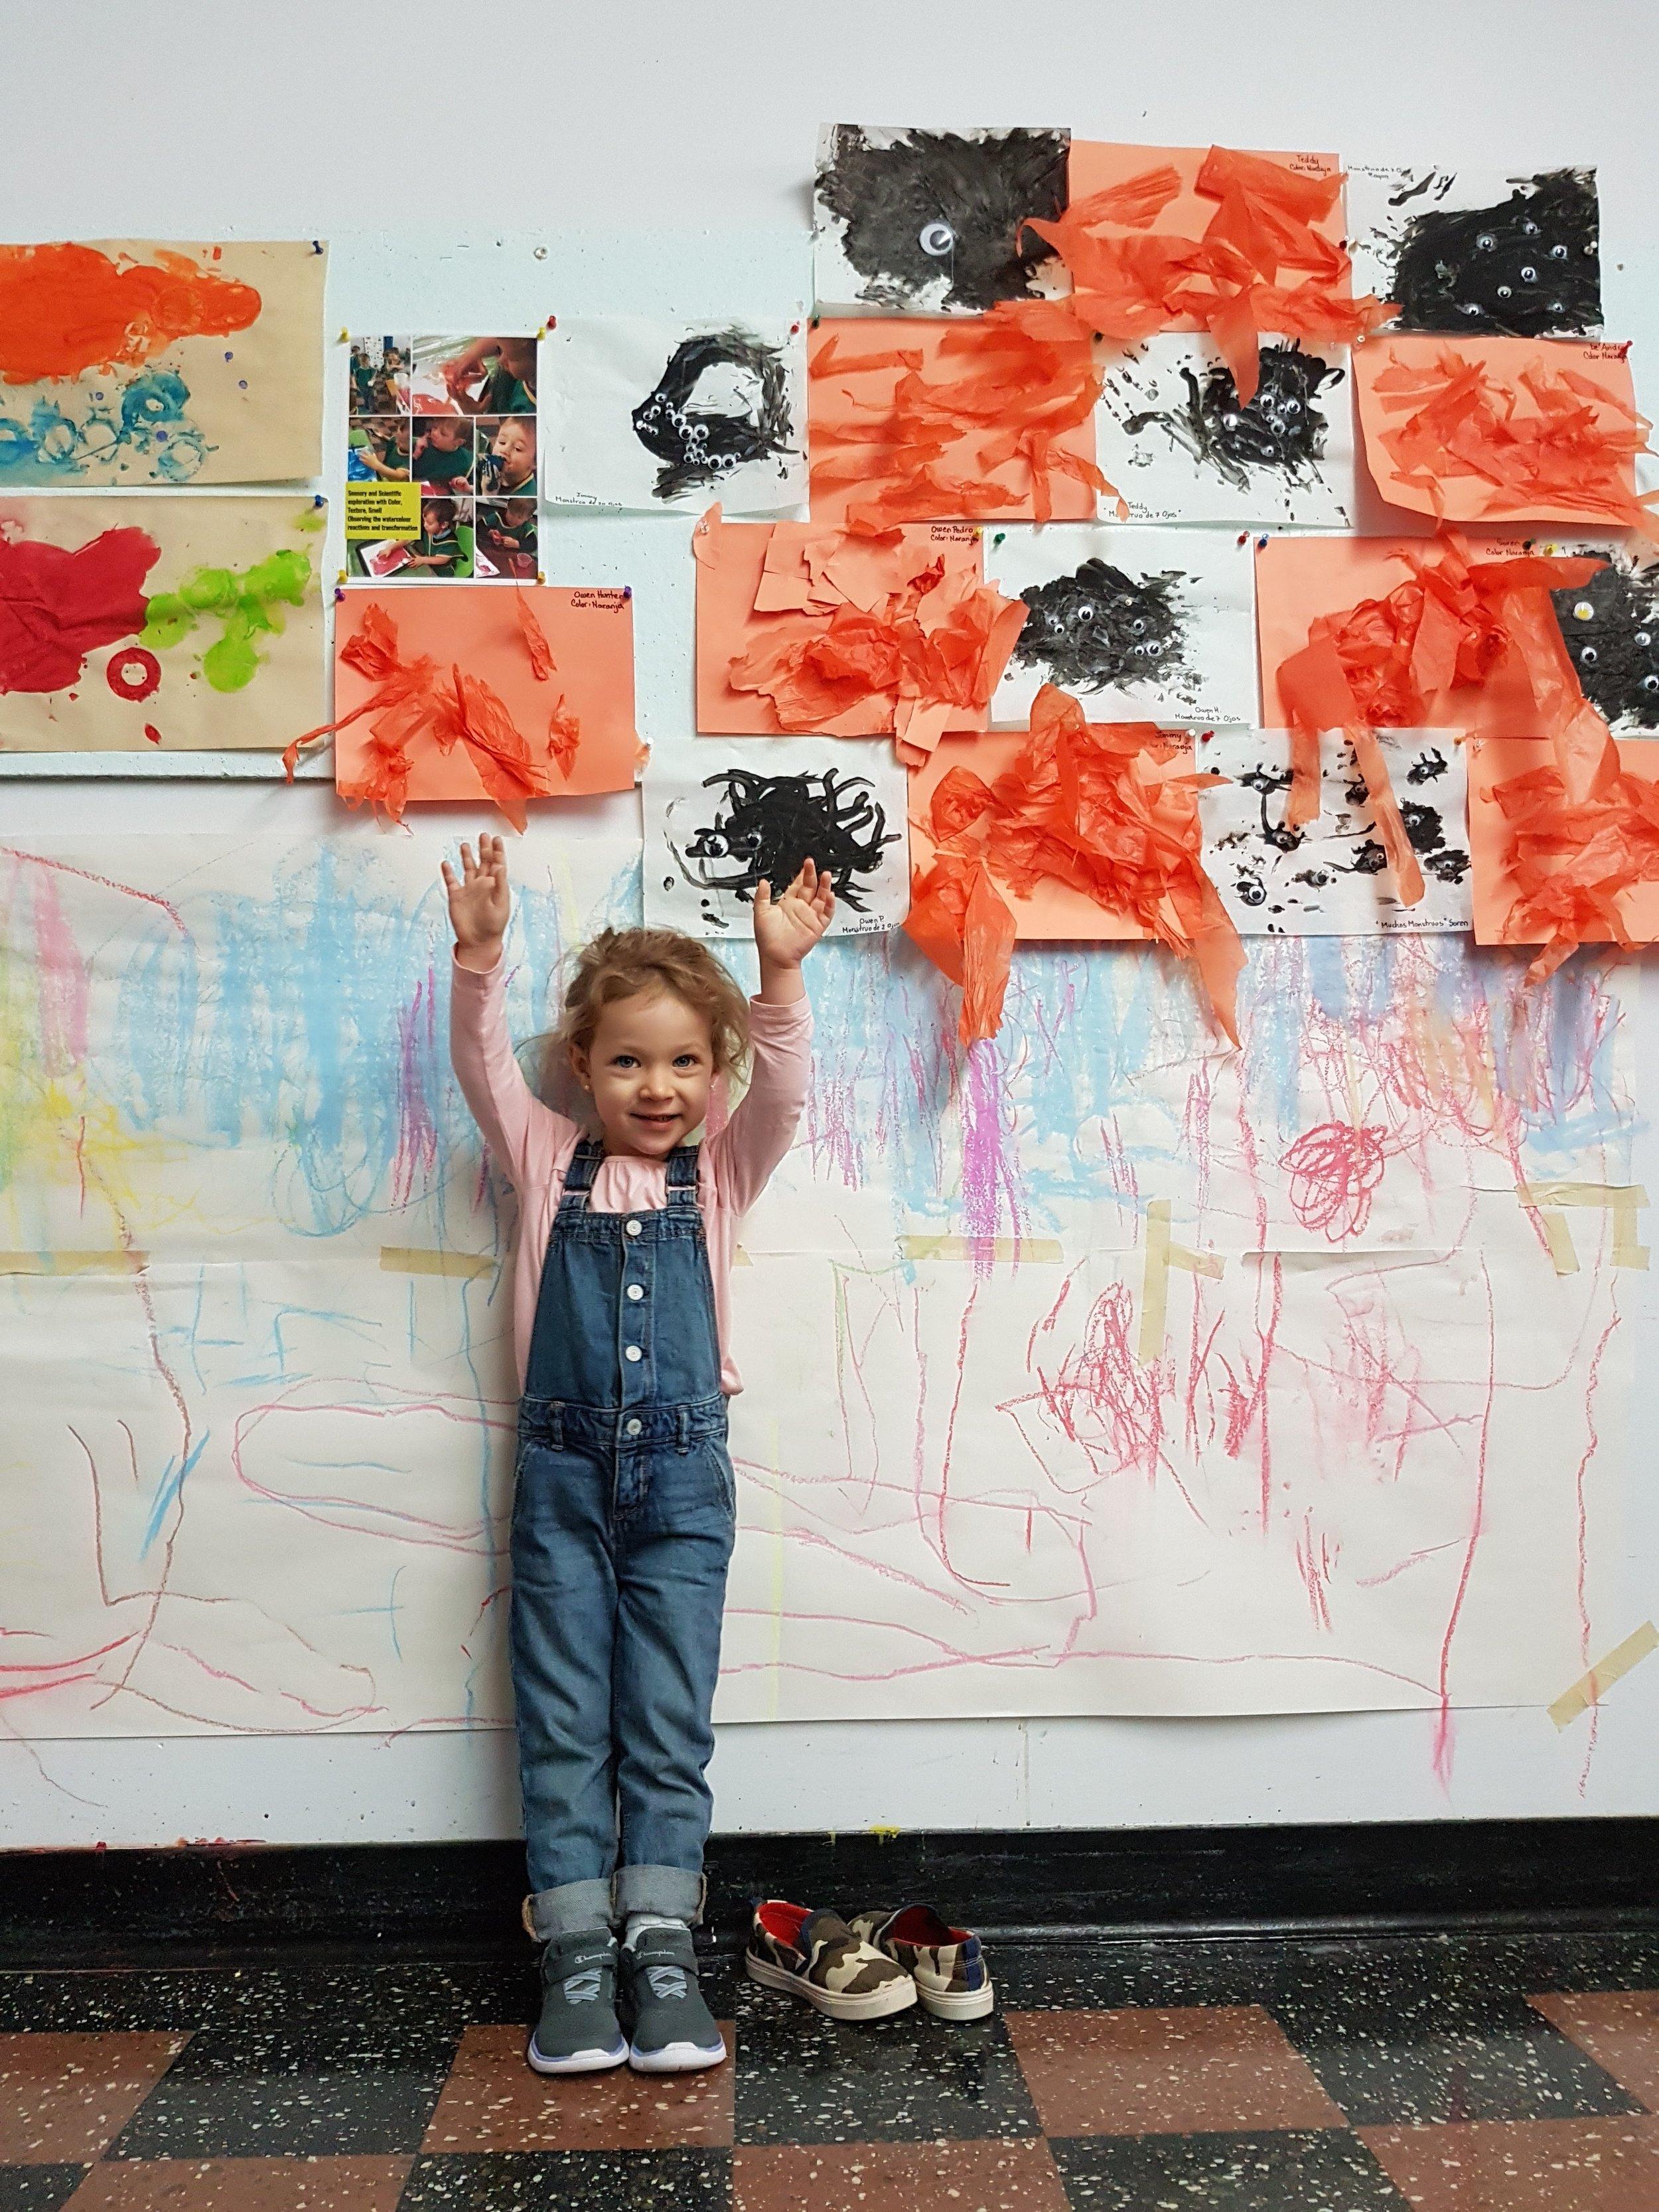 attachment parenting and preschool drop off